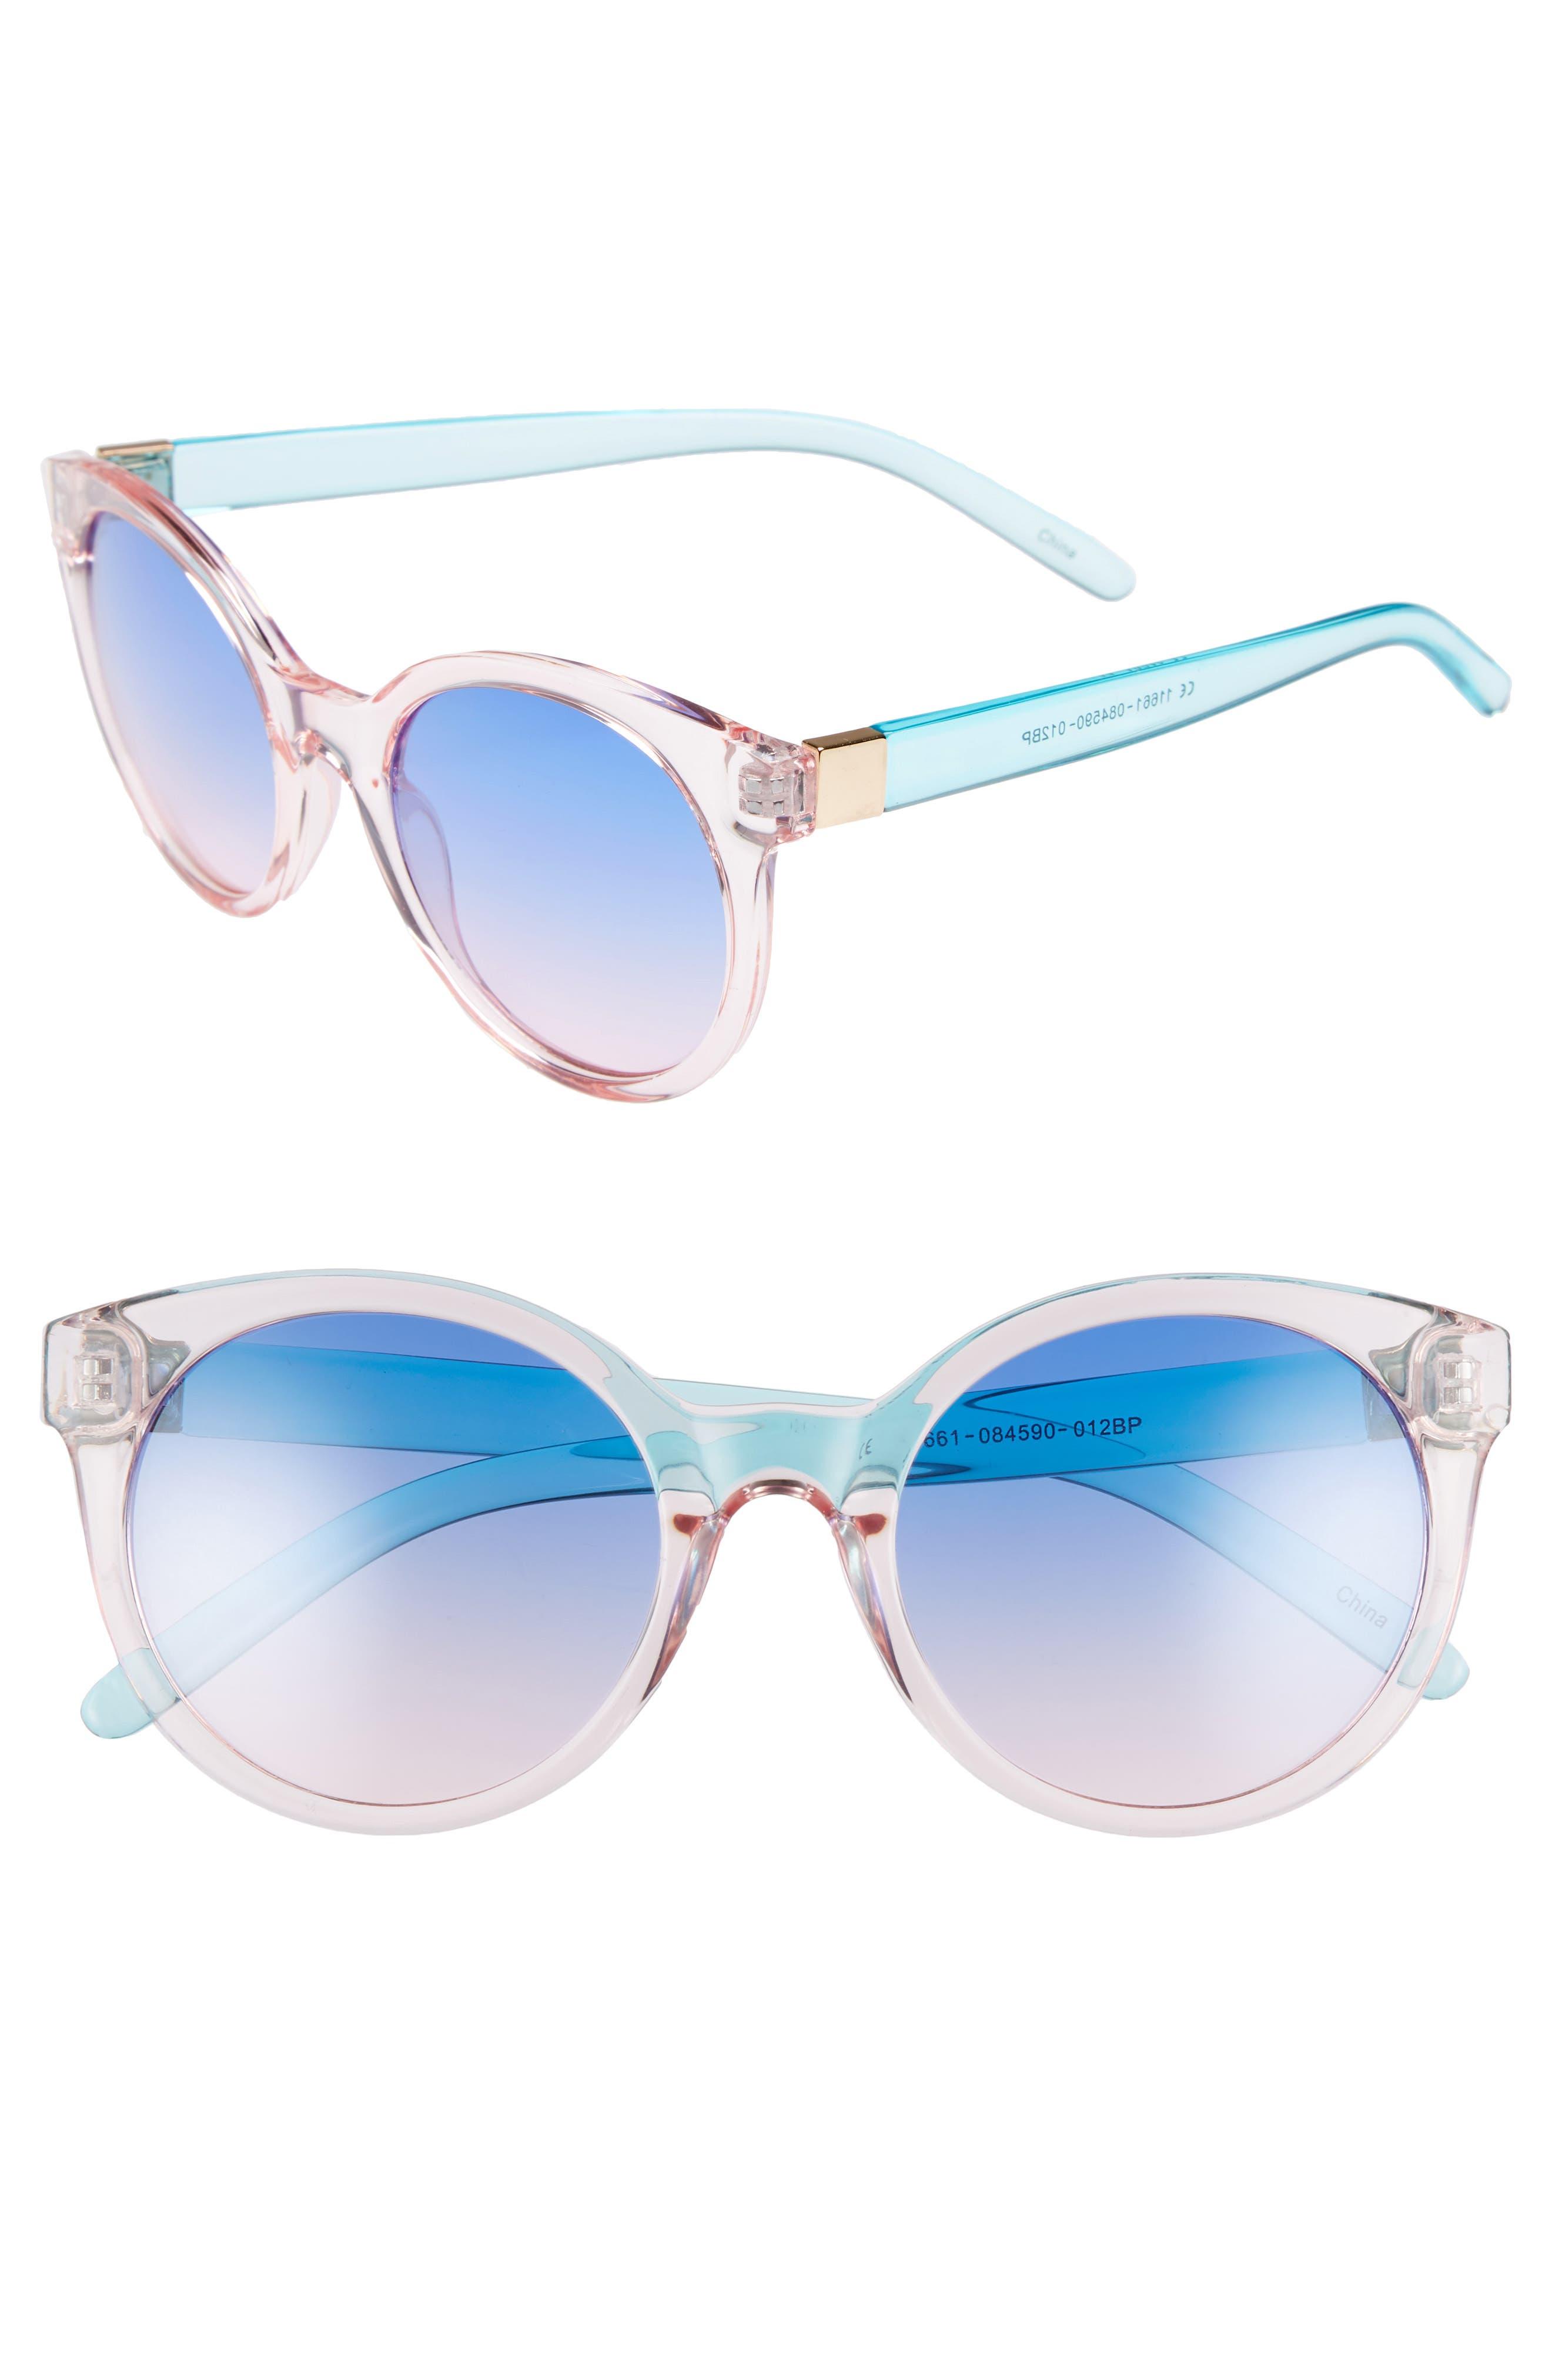 Transparent Round Sunglasses,                             Main thumbnail 1, color,                             Multi